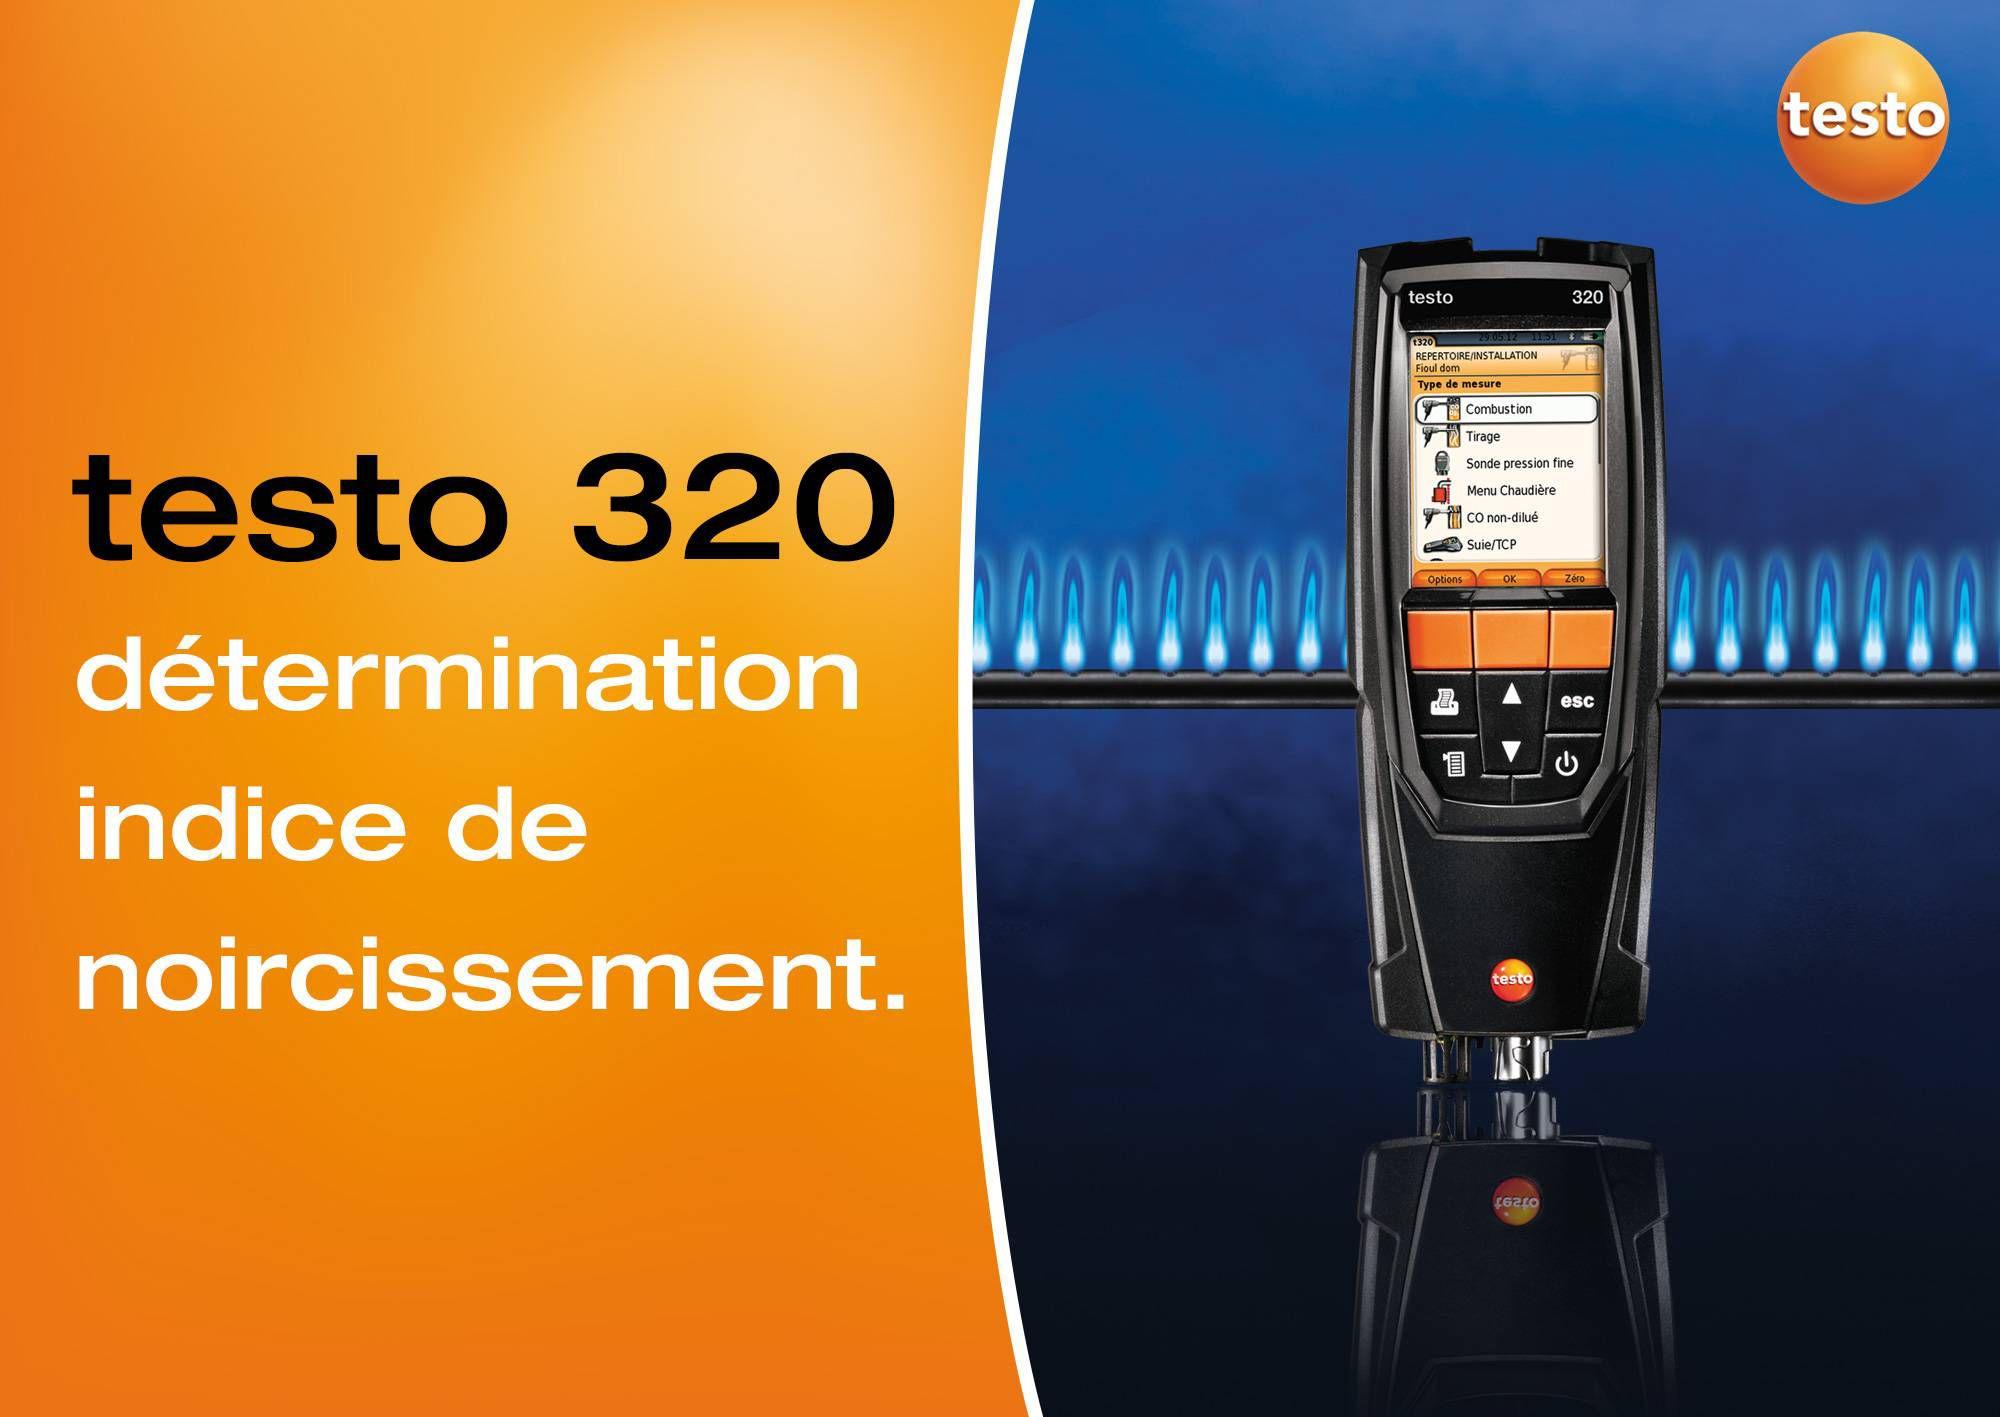 tutoriel vidéo mesure indice de noircissement testo 320